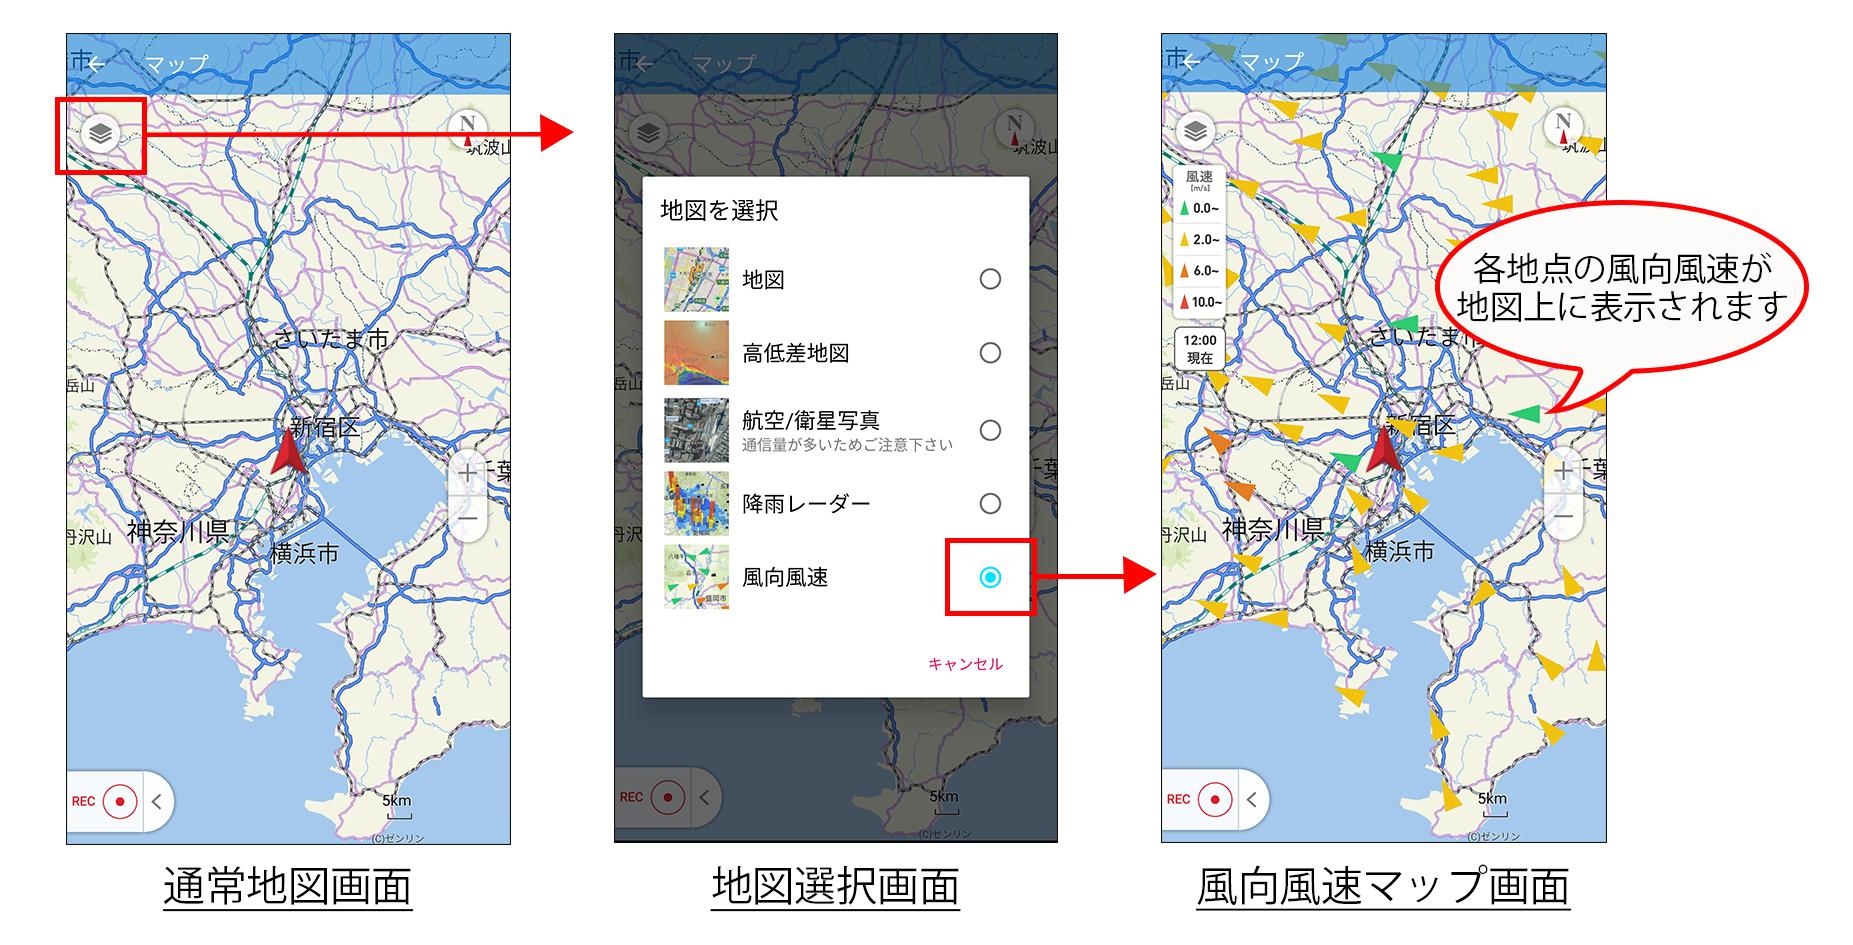 http://corporate.navitime.co.jp/topics/61146472b429ae263a211d4209754e64266460c8.png